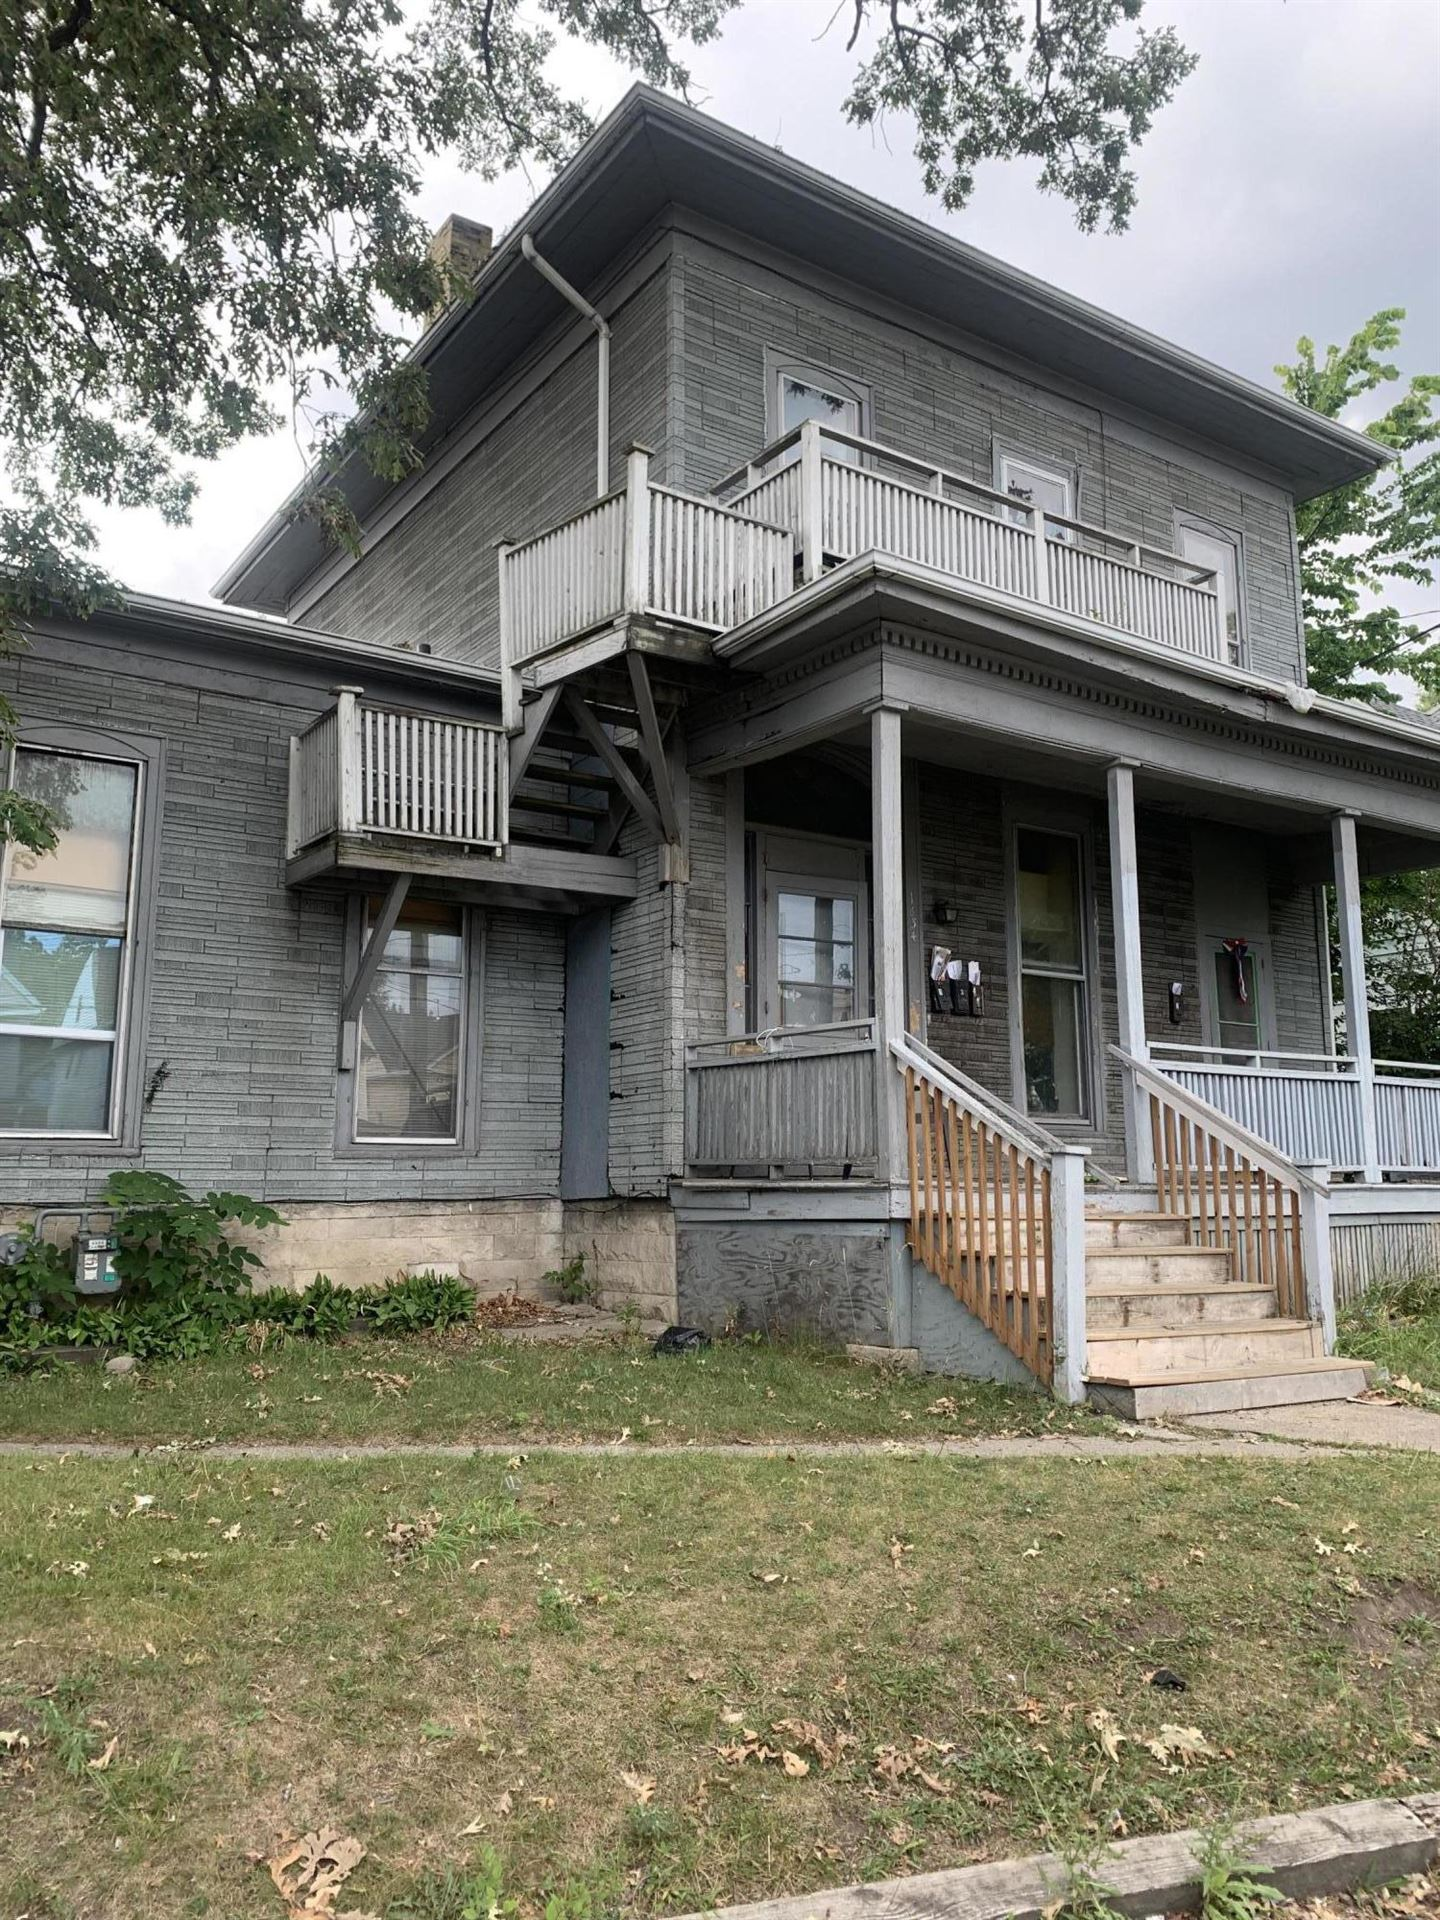 1634 Taylor Ave, Racine, WI 53403 - #: 1757803